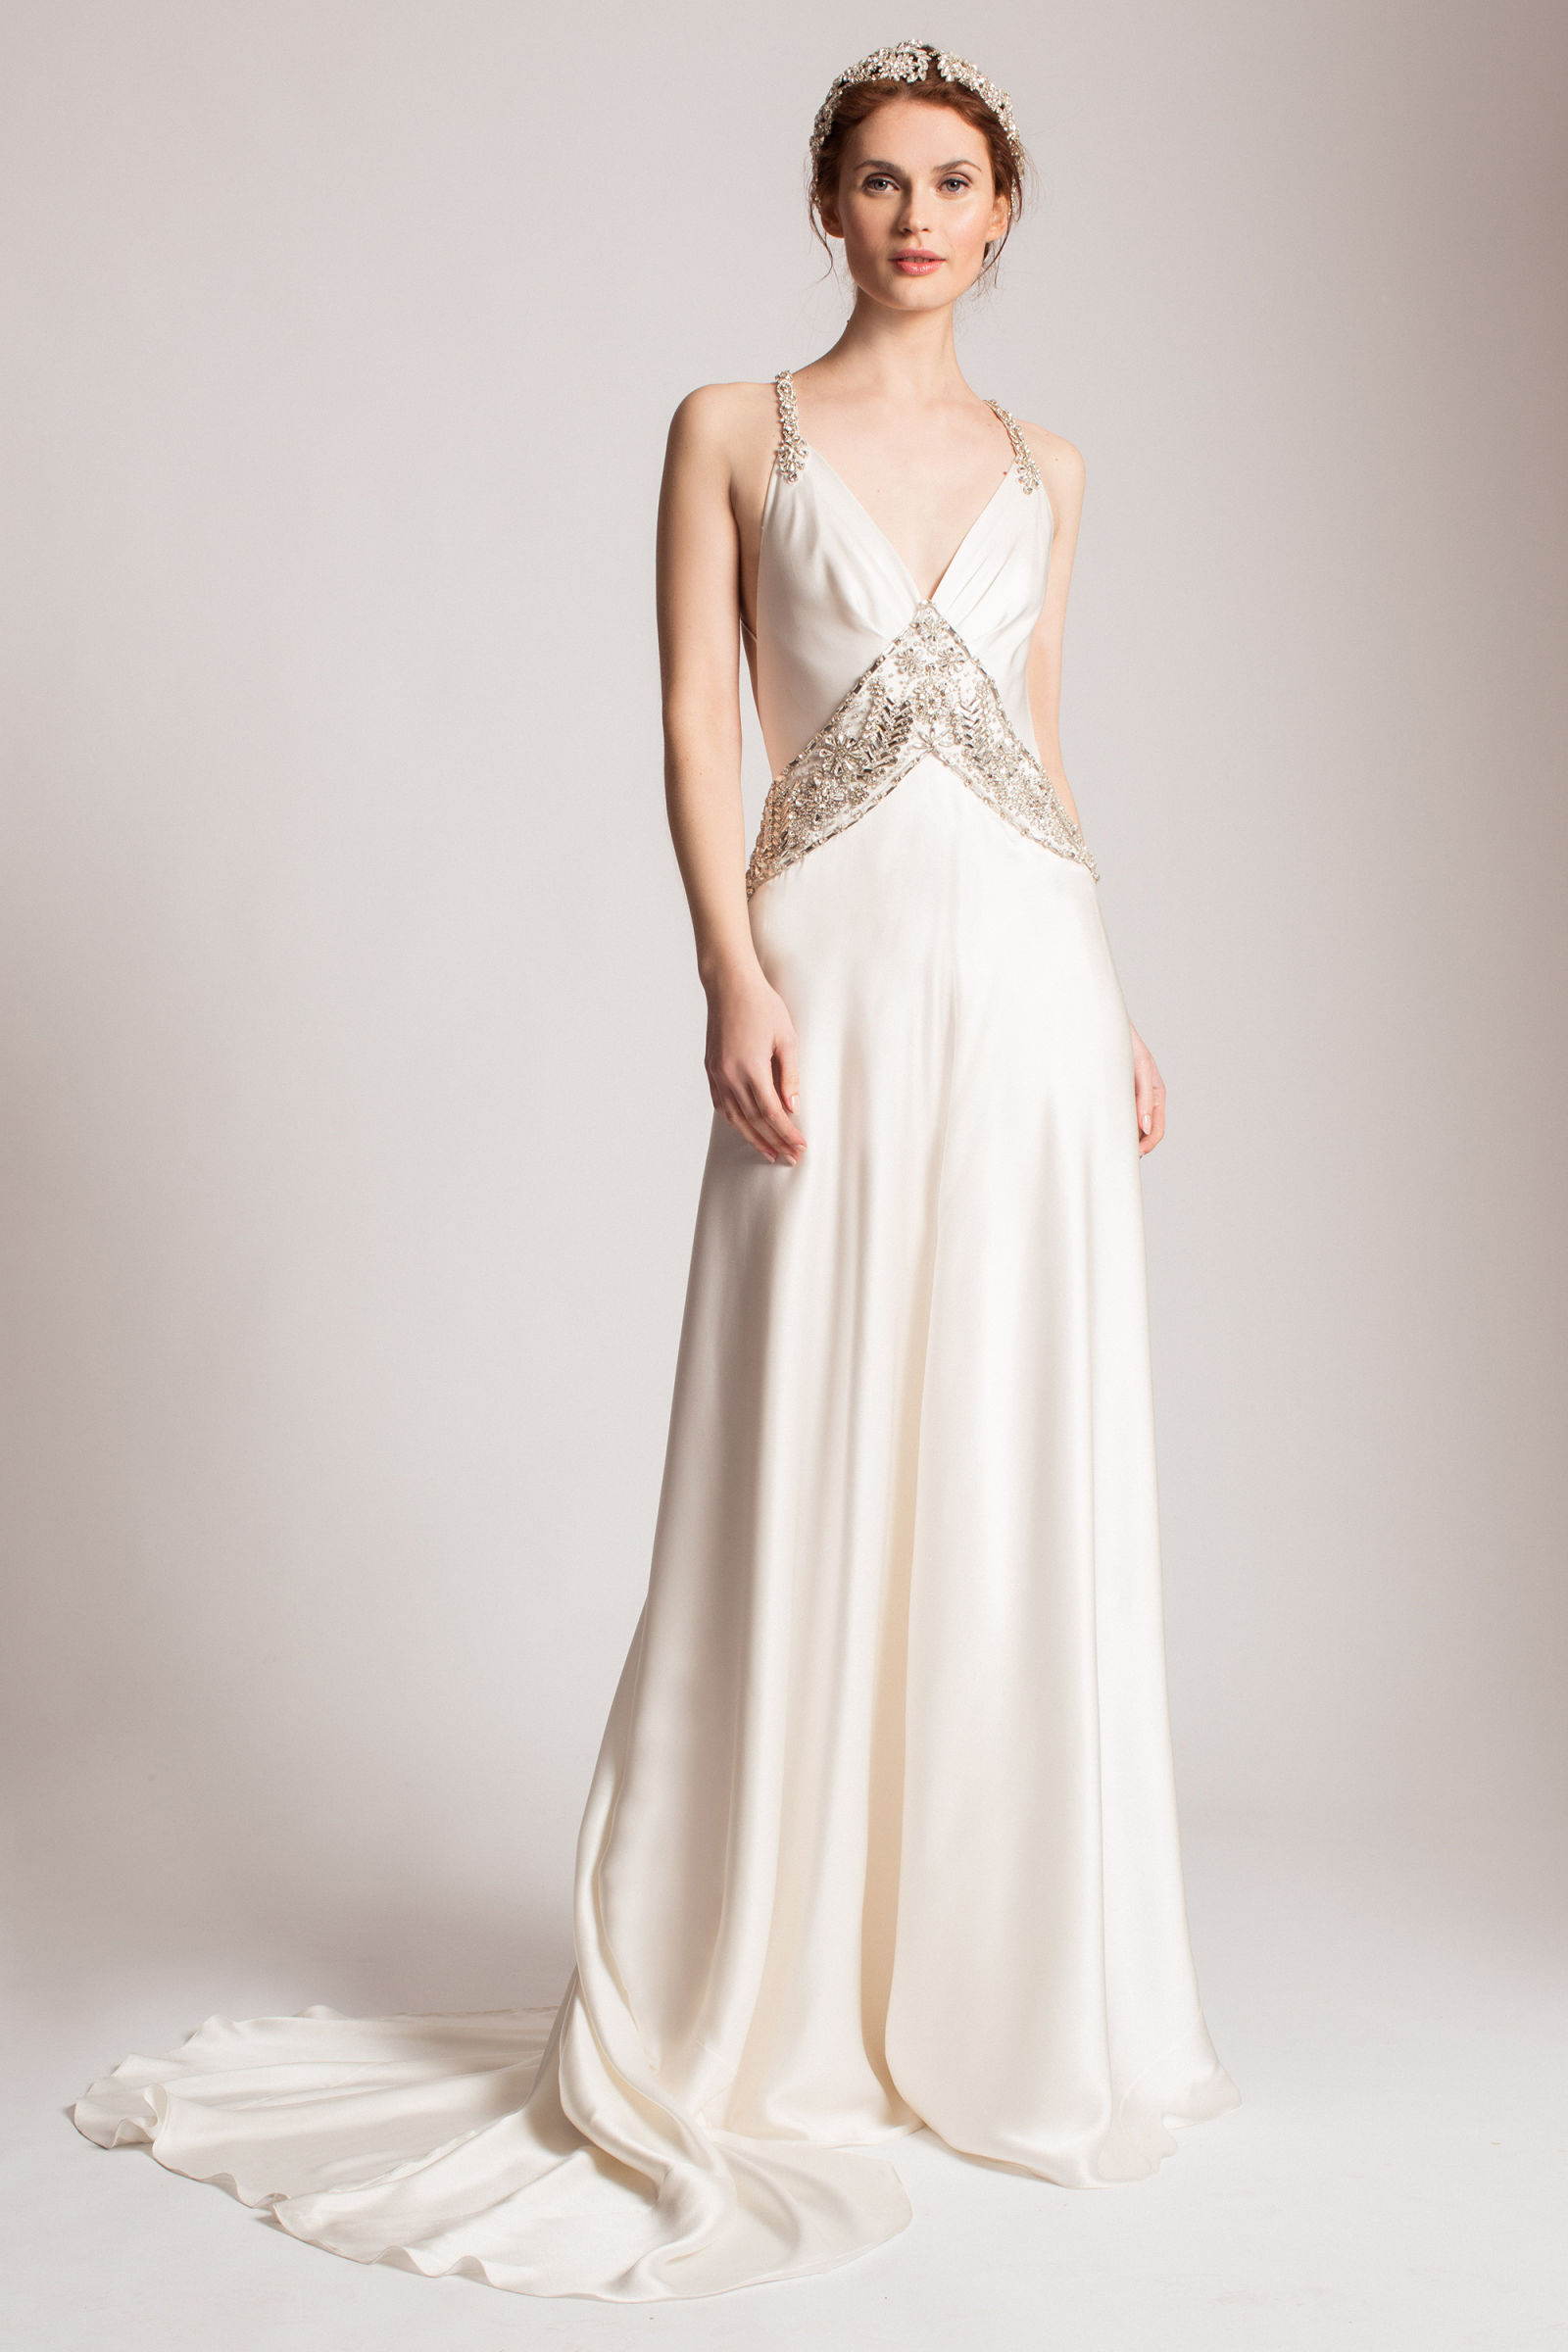 Bridal Fashion Show 2016 Spring Designer Wedding